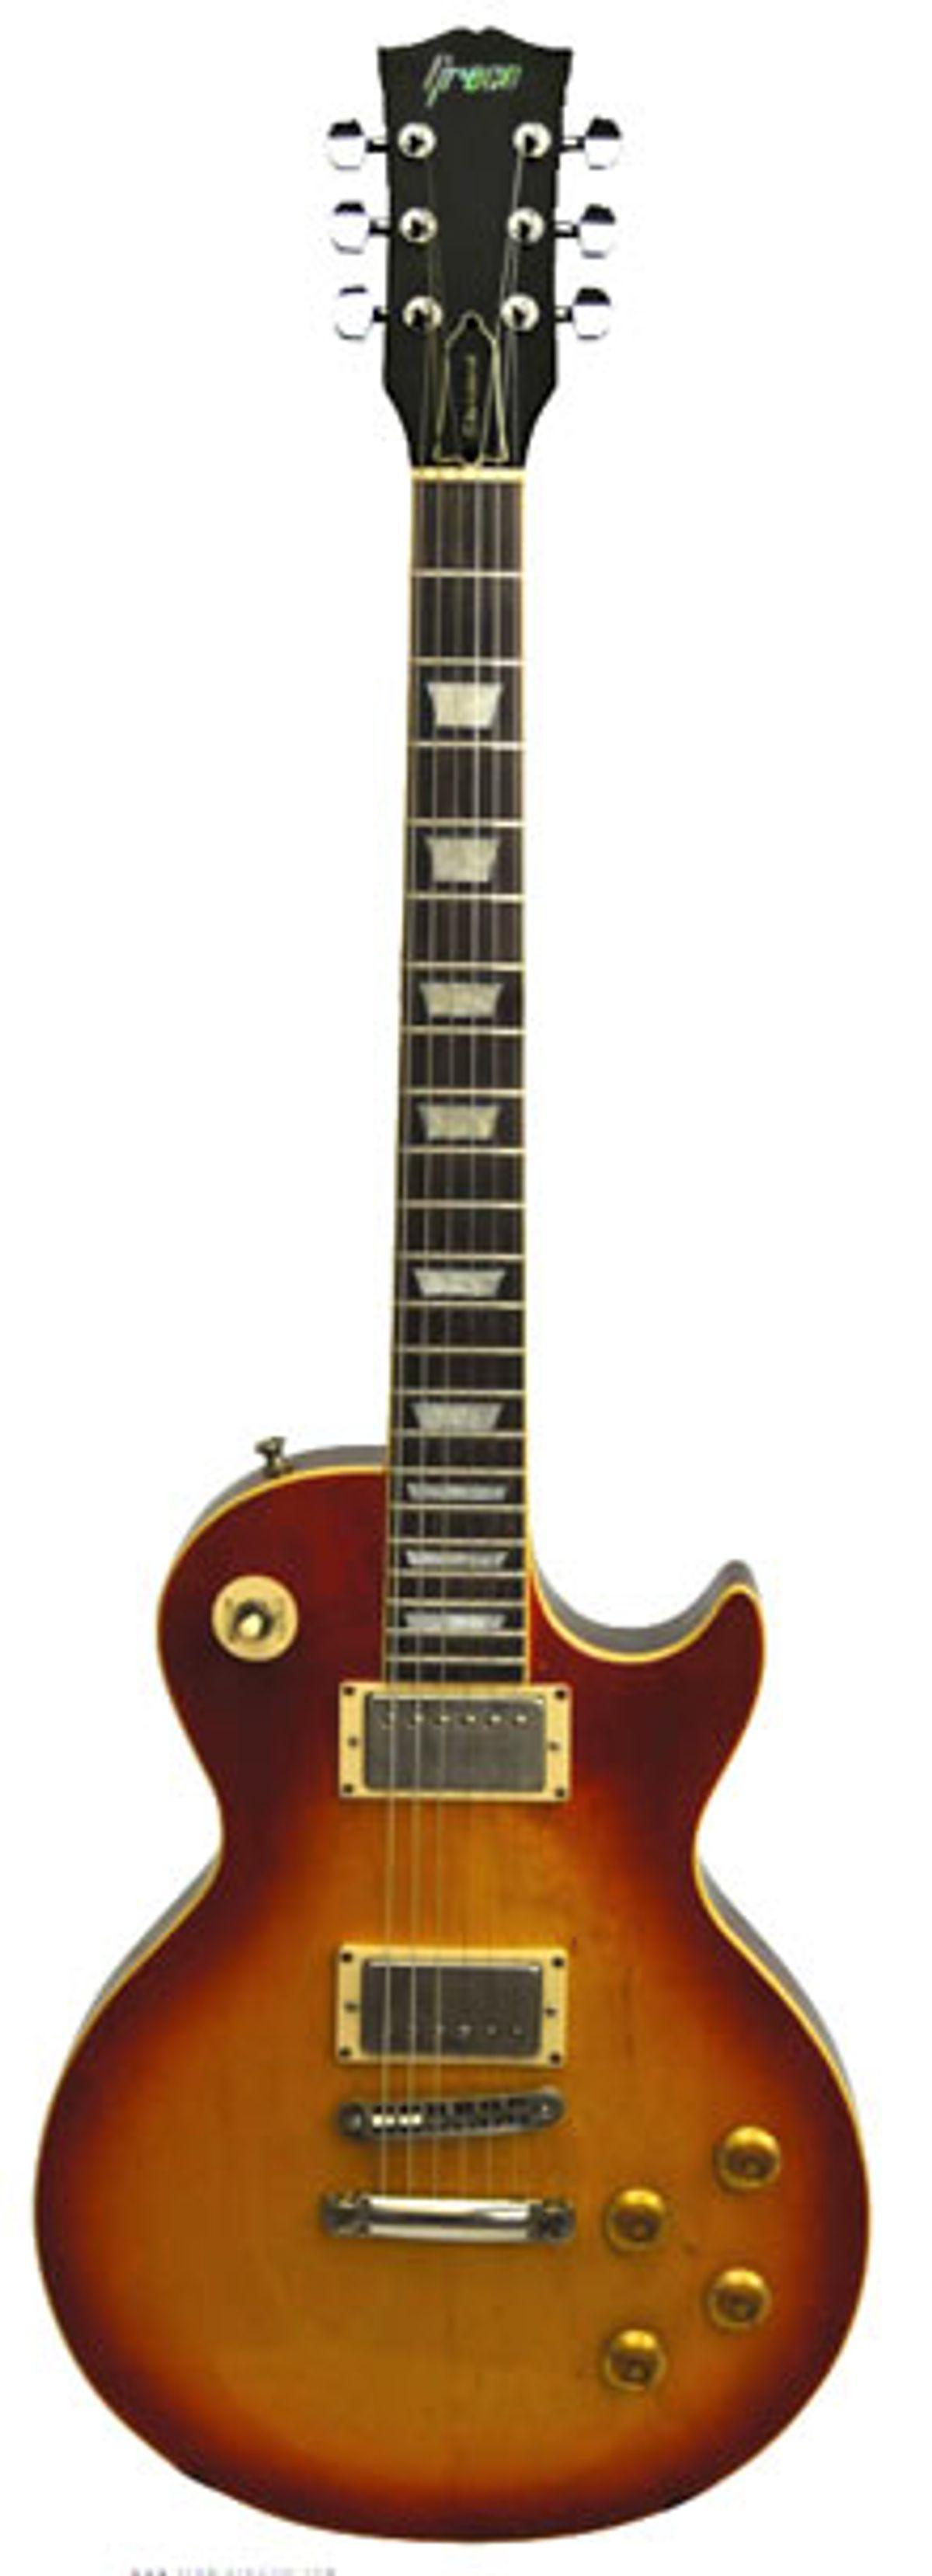 1978 Greco EG-700 Replica Les Paul